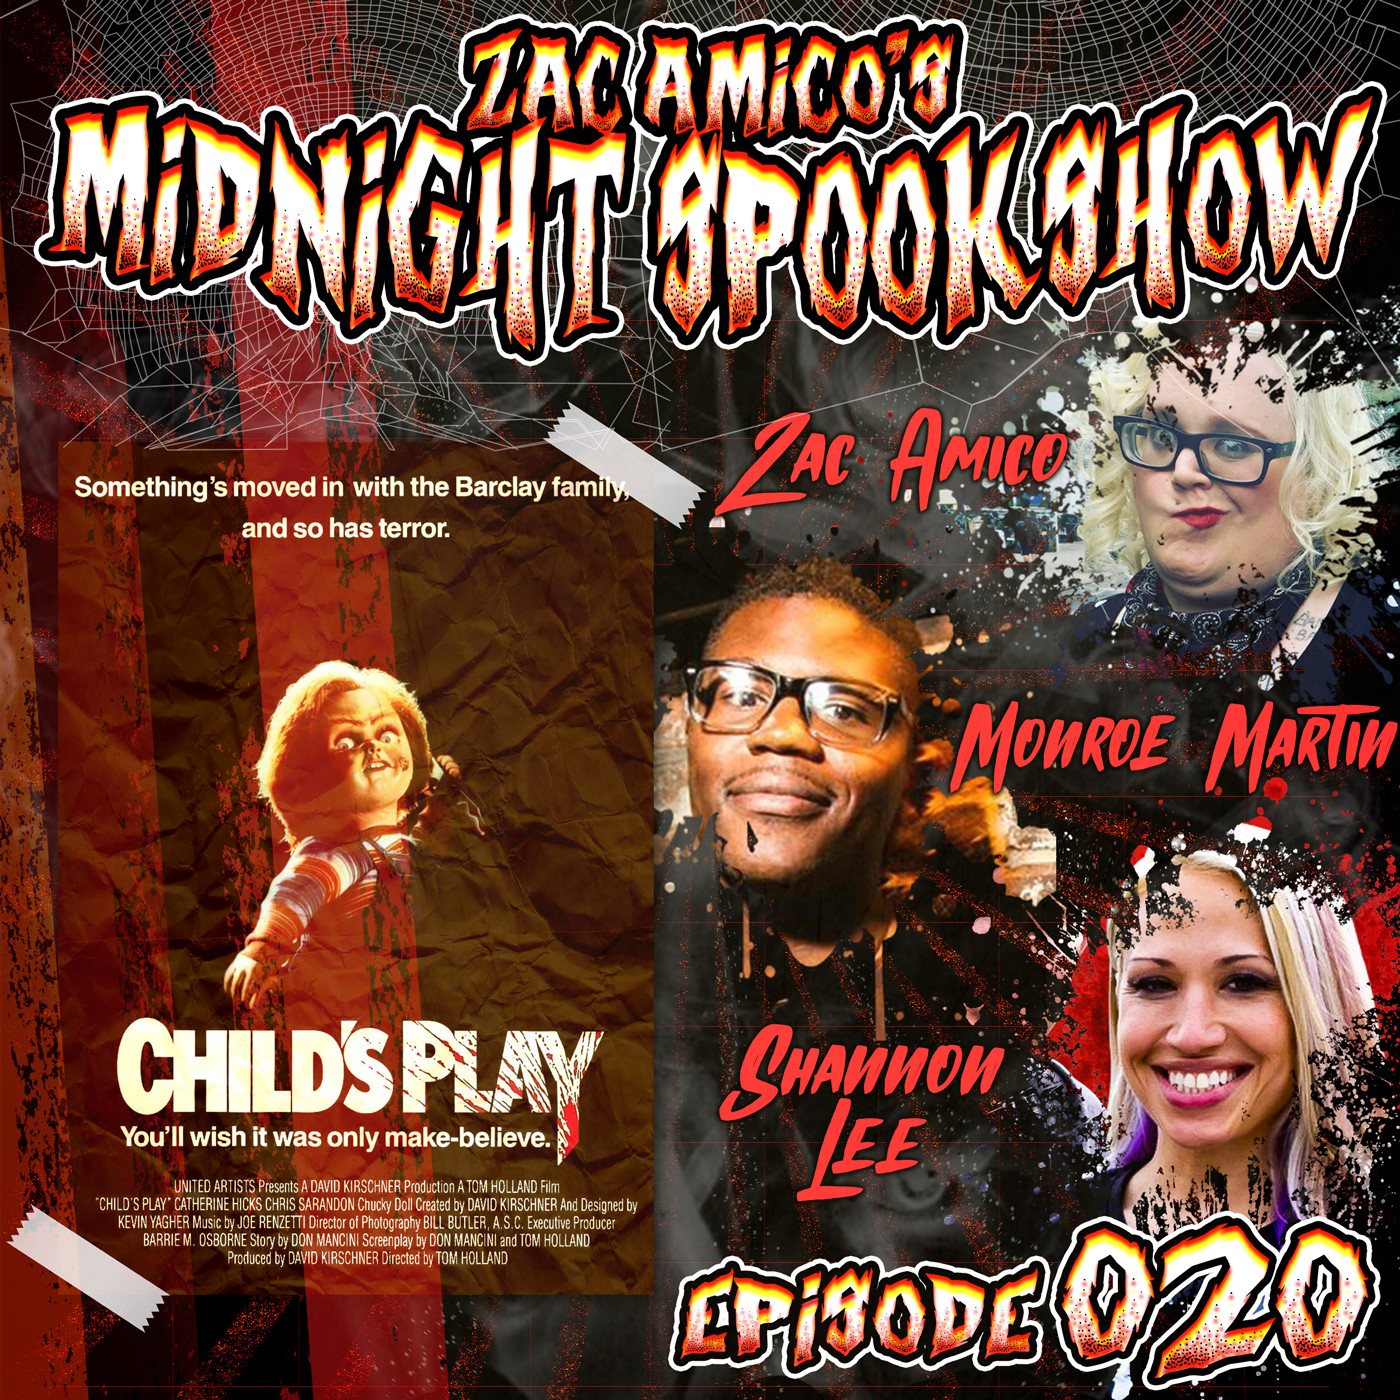 Child's Play - Monroe Martin & Shannon Lee - Episode #020